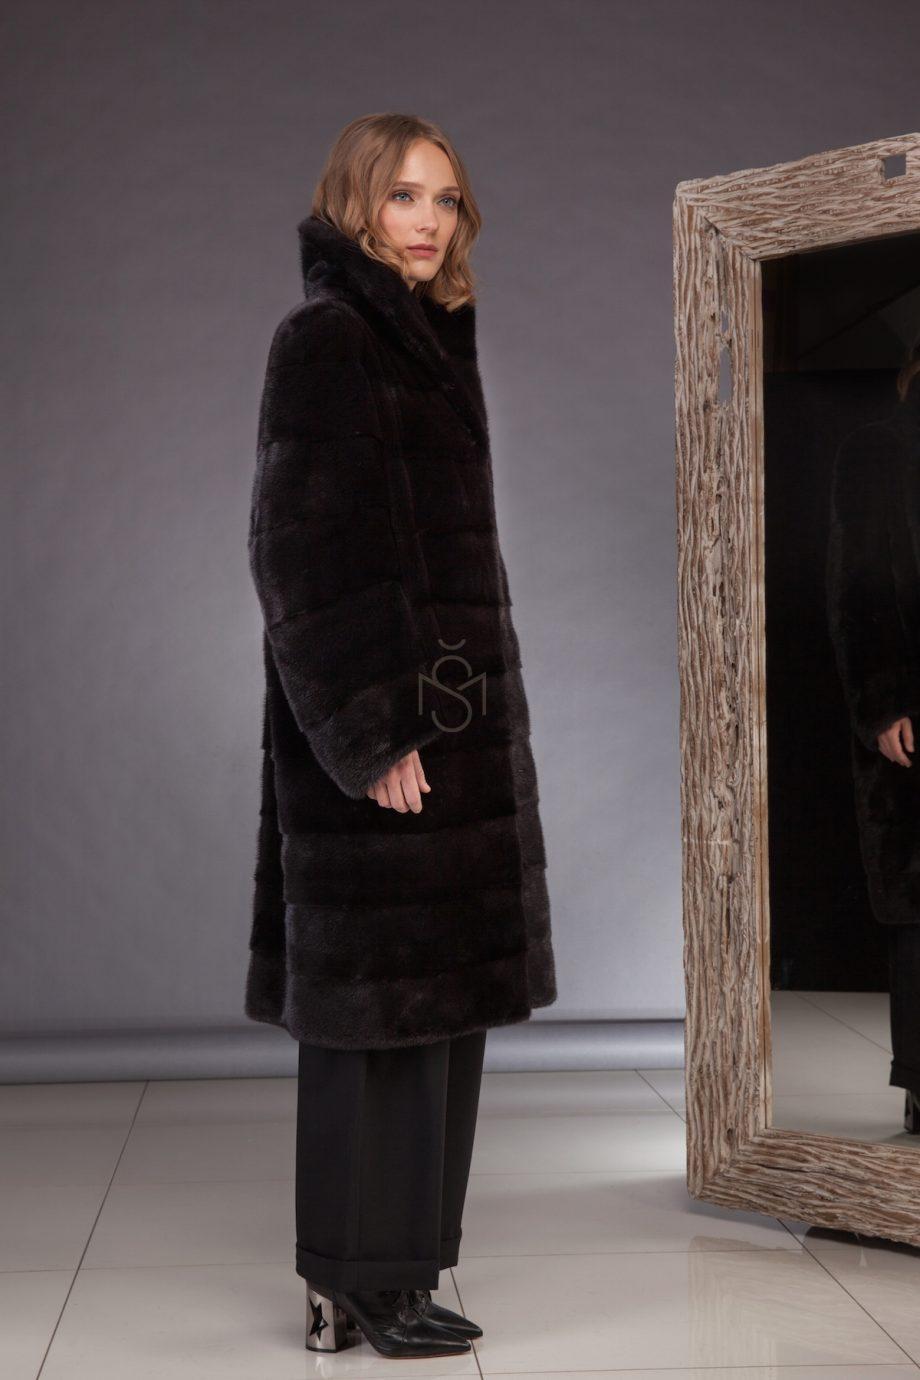 High quality mink fur coat made by SILTA MADA fur studio in Vilnius